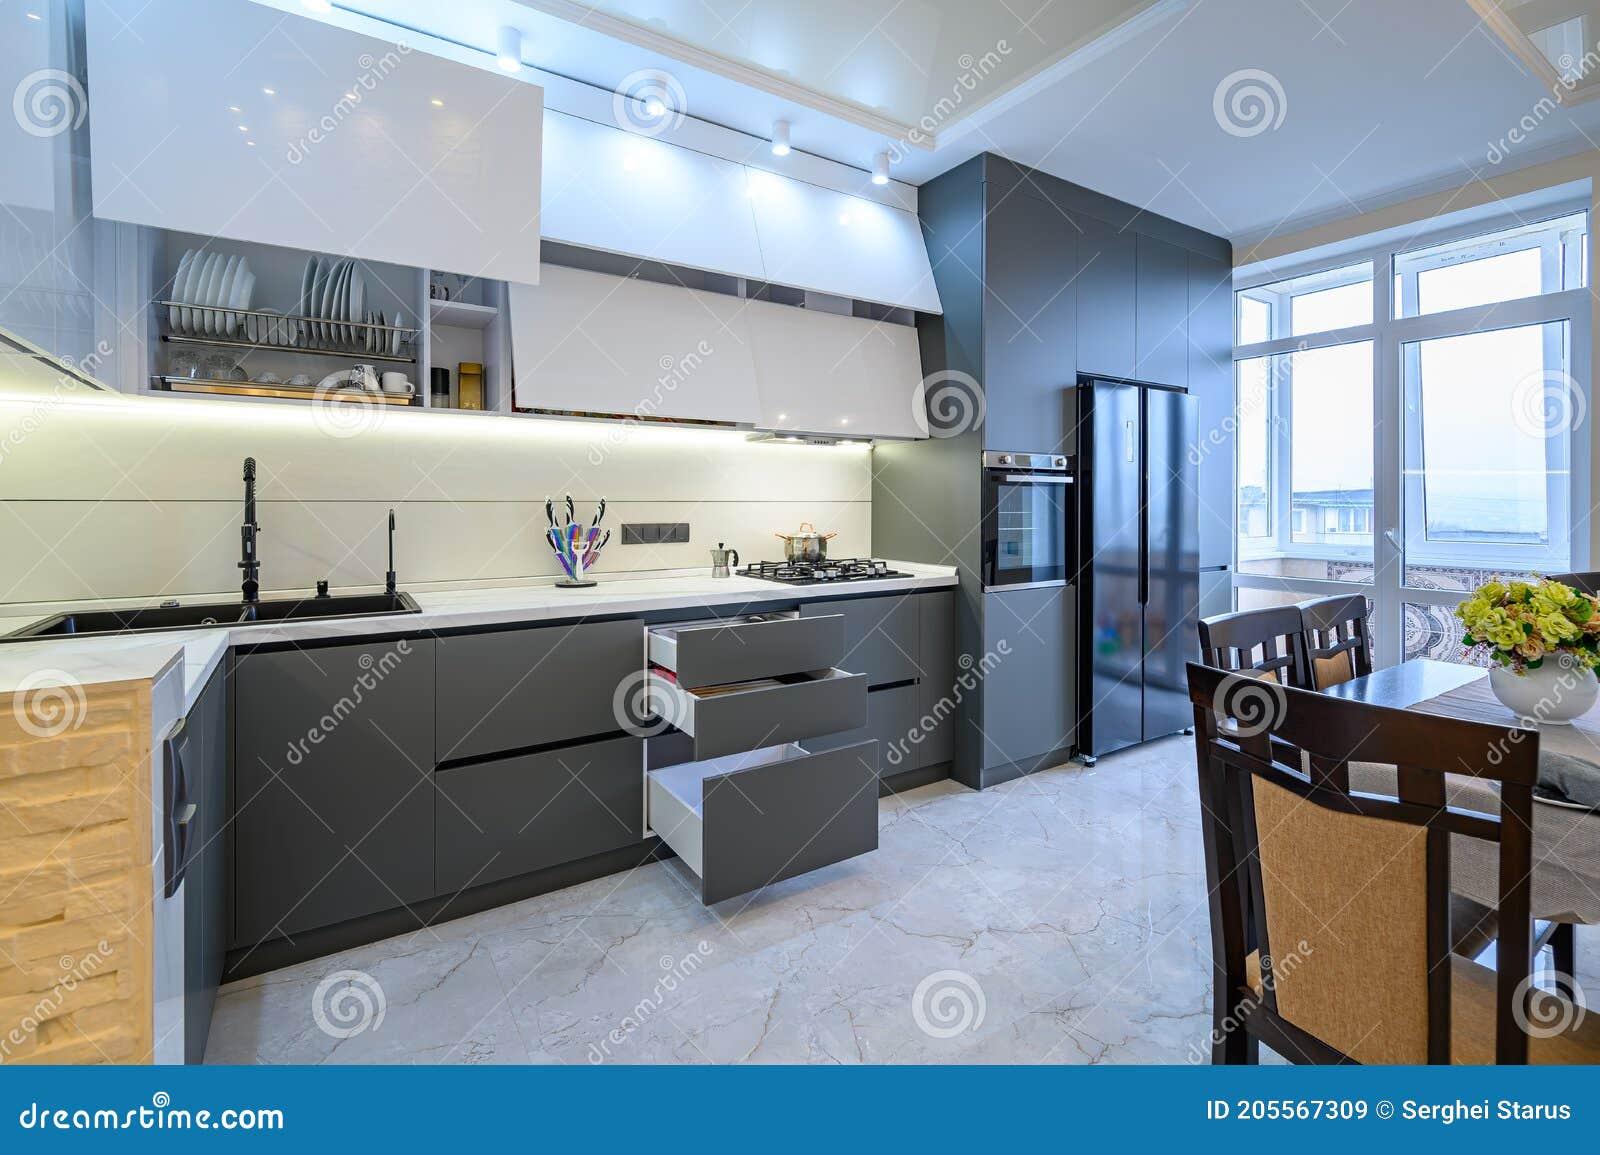 Luxury White And Dark Grey Modern Kitchen Interior Stock Image Image Of Facade Bright 205567309